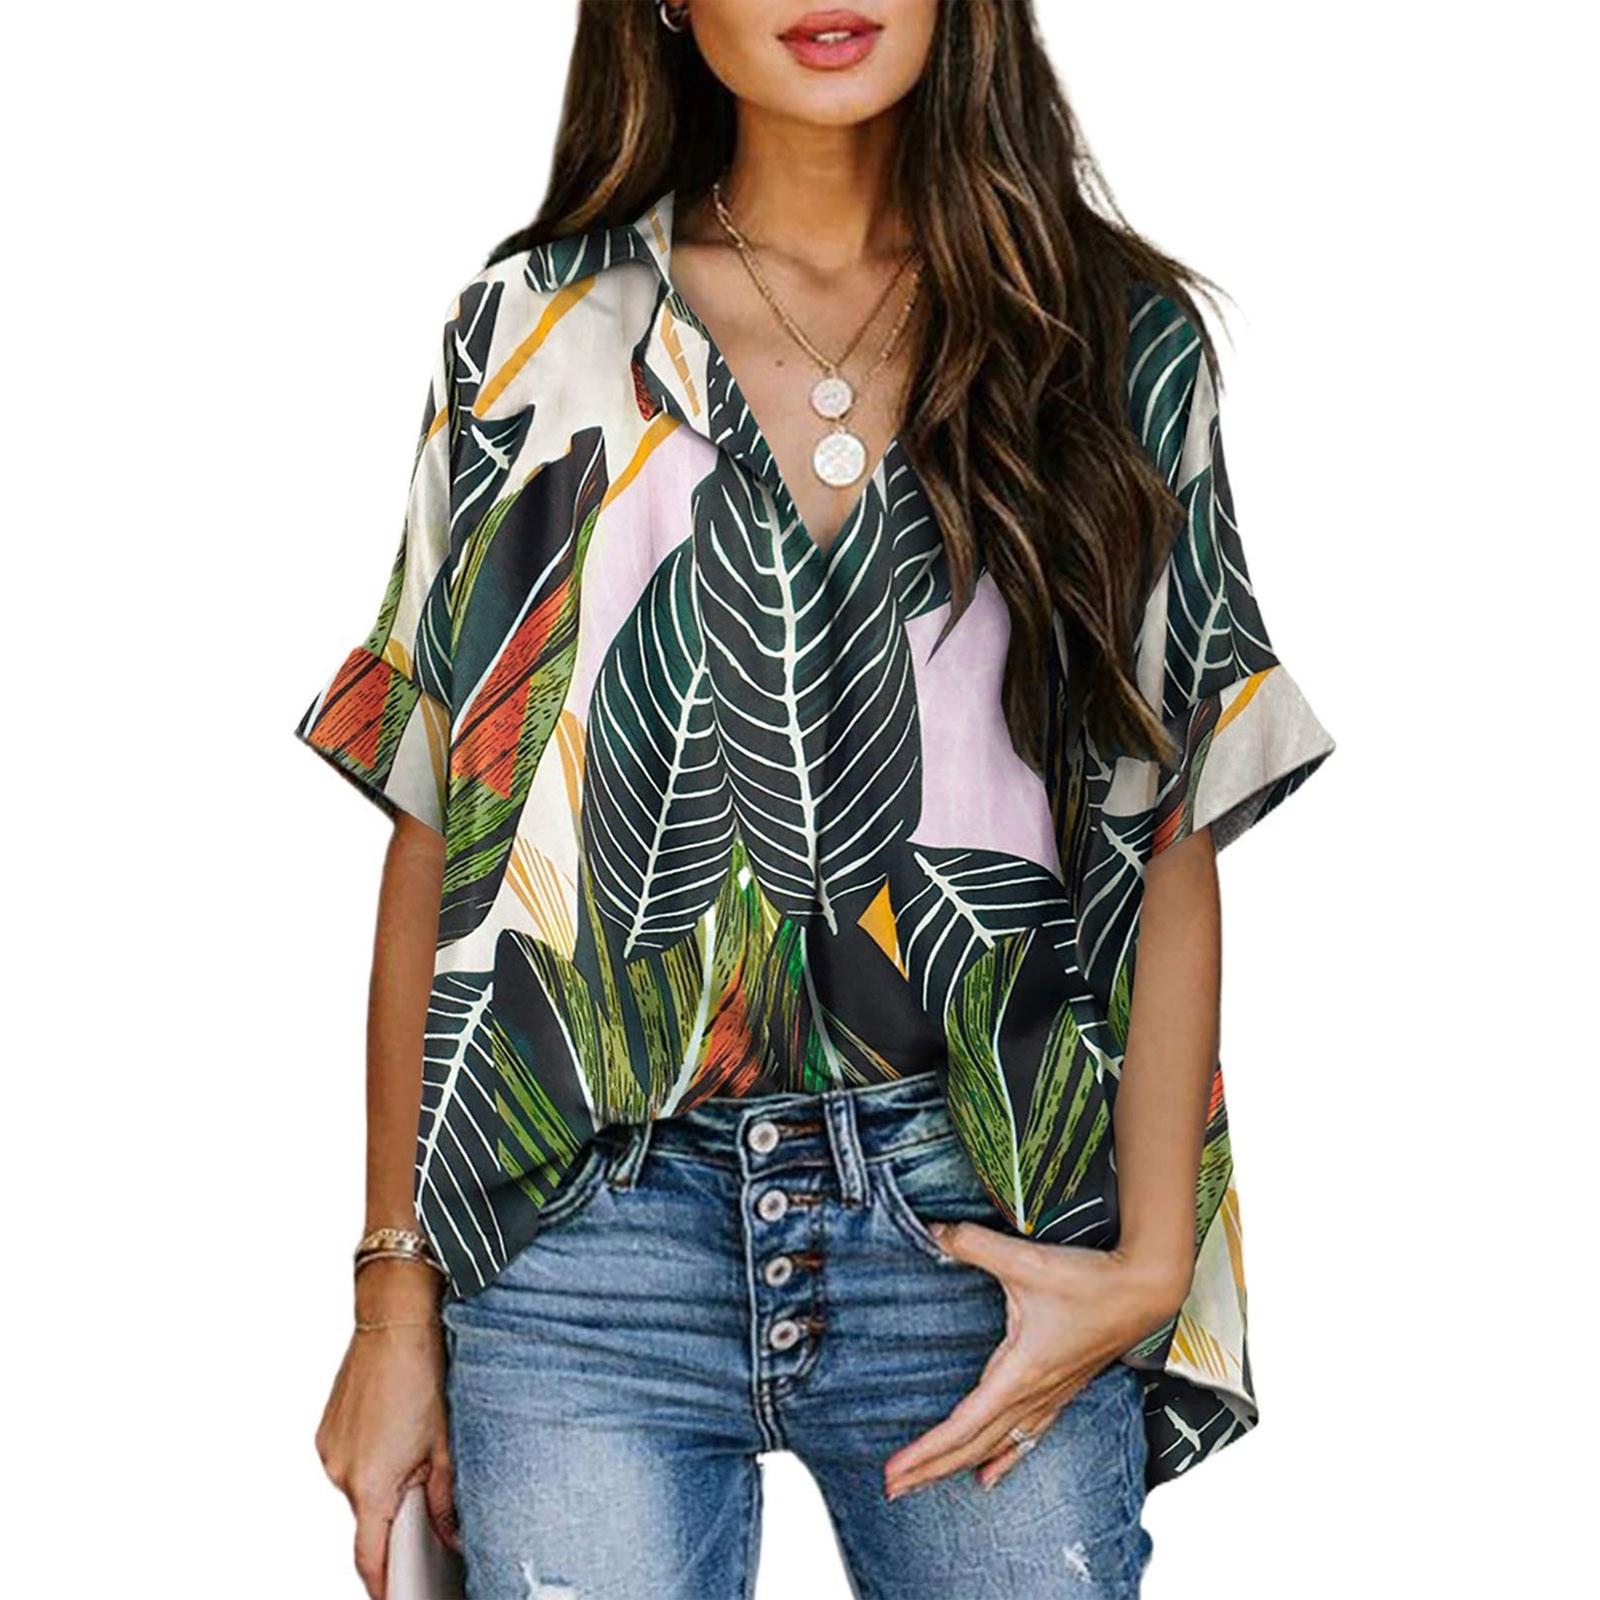 Women Loose Leaves Blouse Summer Woman Casual Chemise Femme Blusas Y Camisas Plus Size Shirts Femme S-xxl